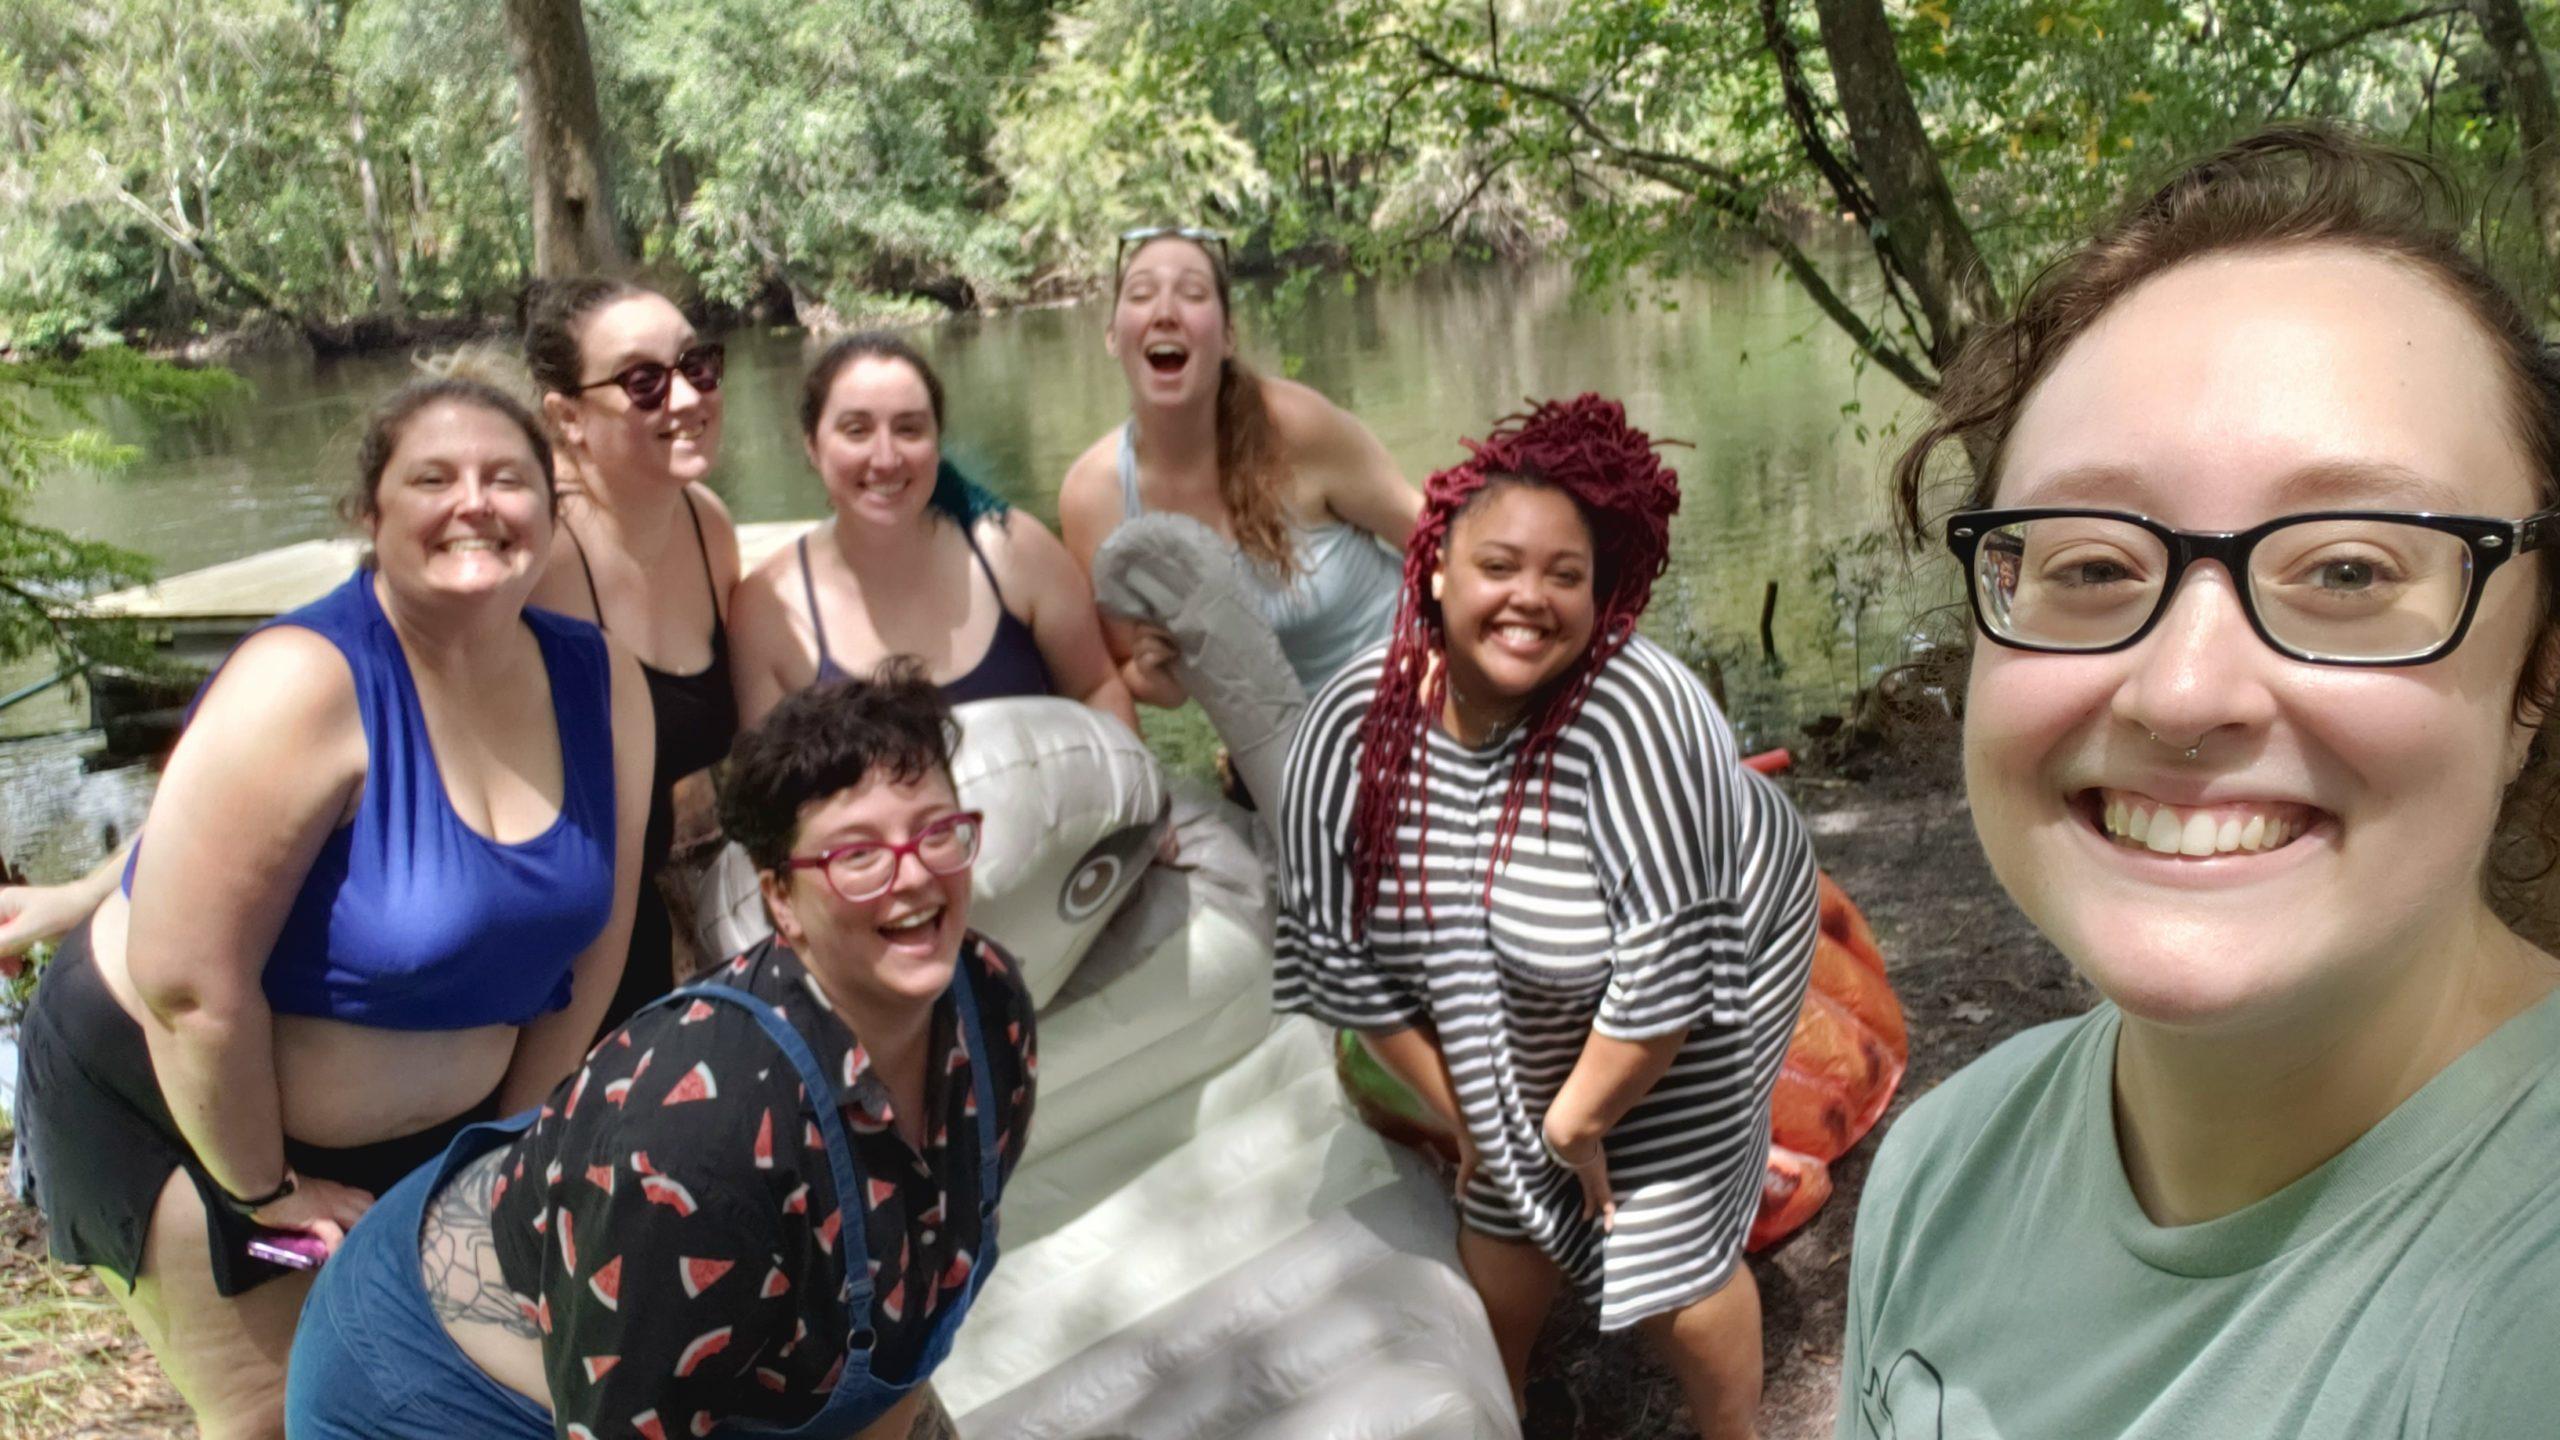 Geek Girl Brunch Gainesville at Warbler's Ecocamp